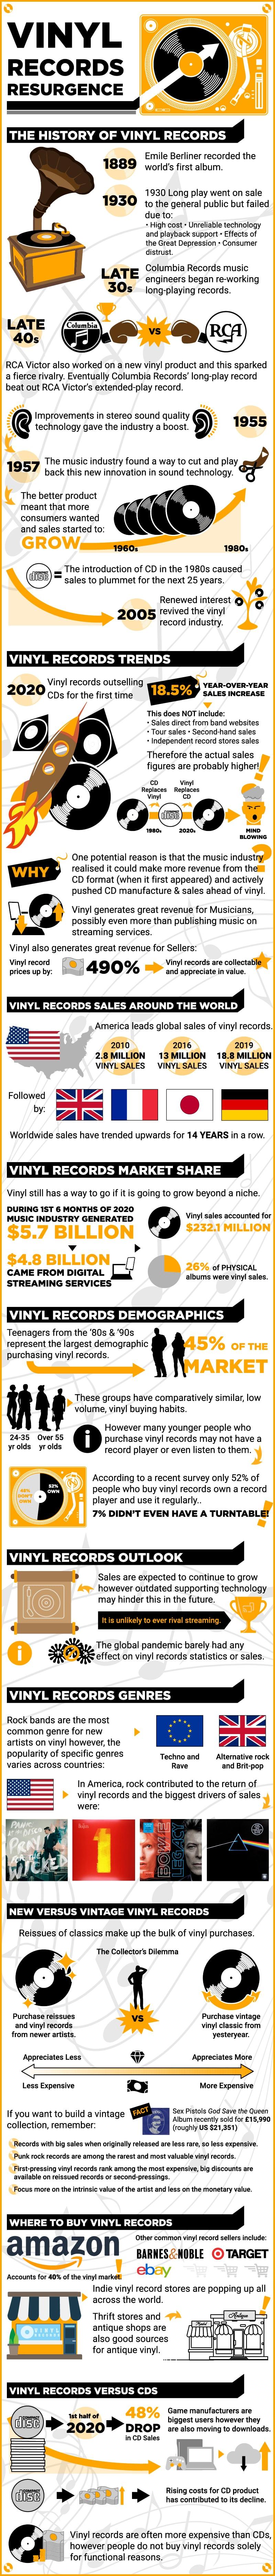 Vinyl Records Statistics Data Trends Infographic